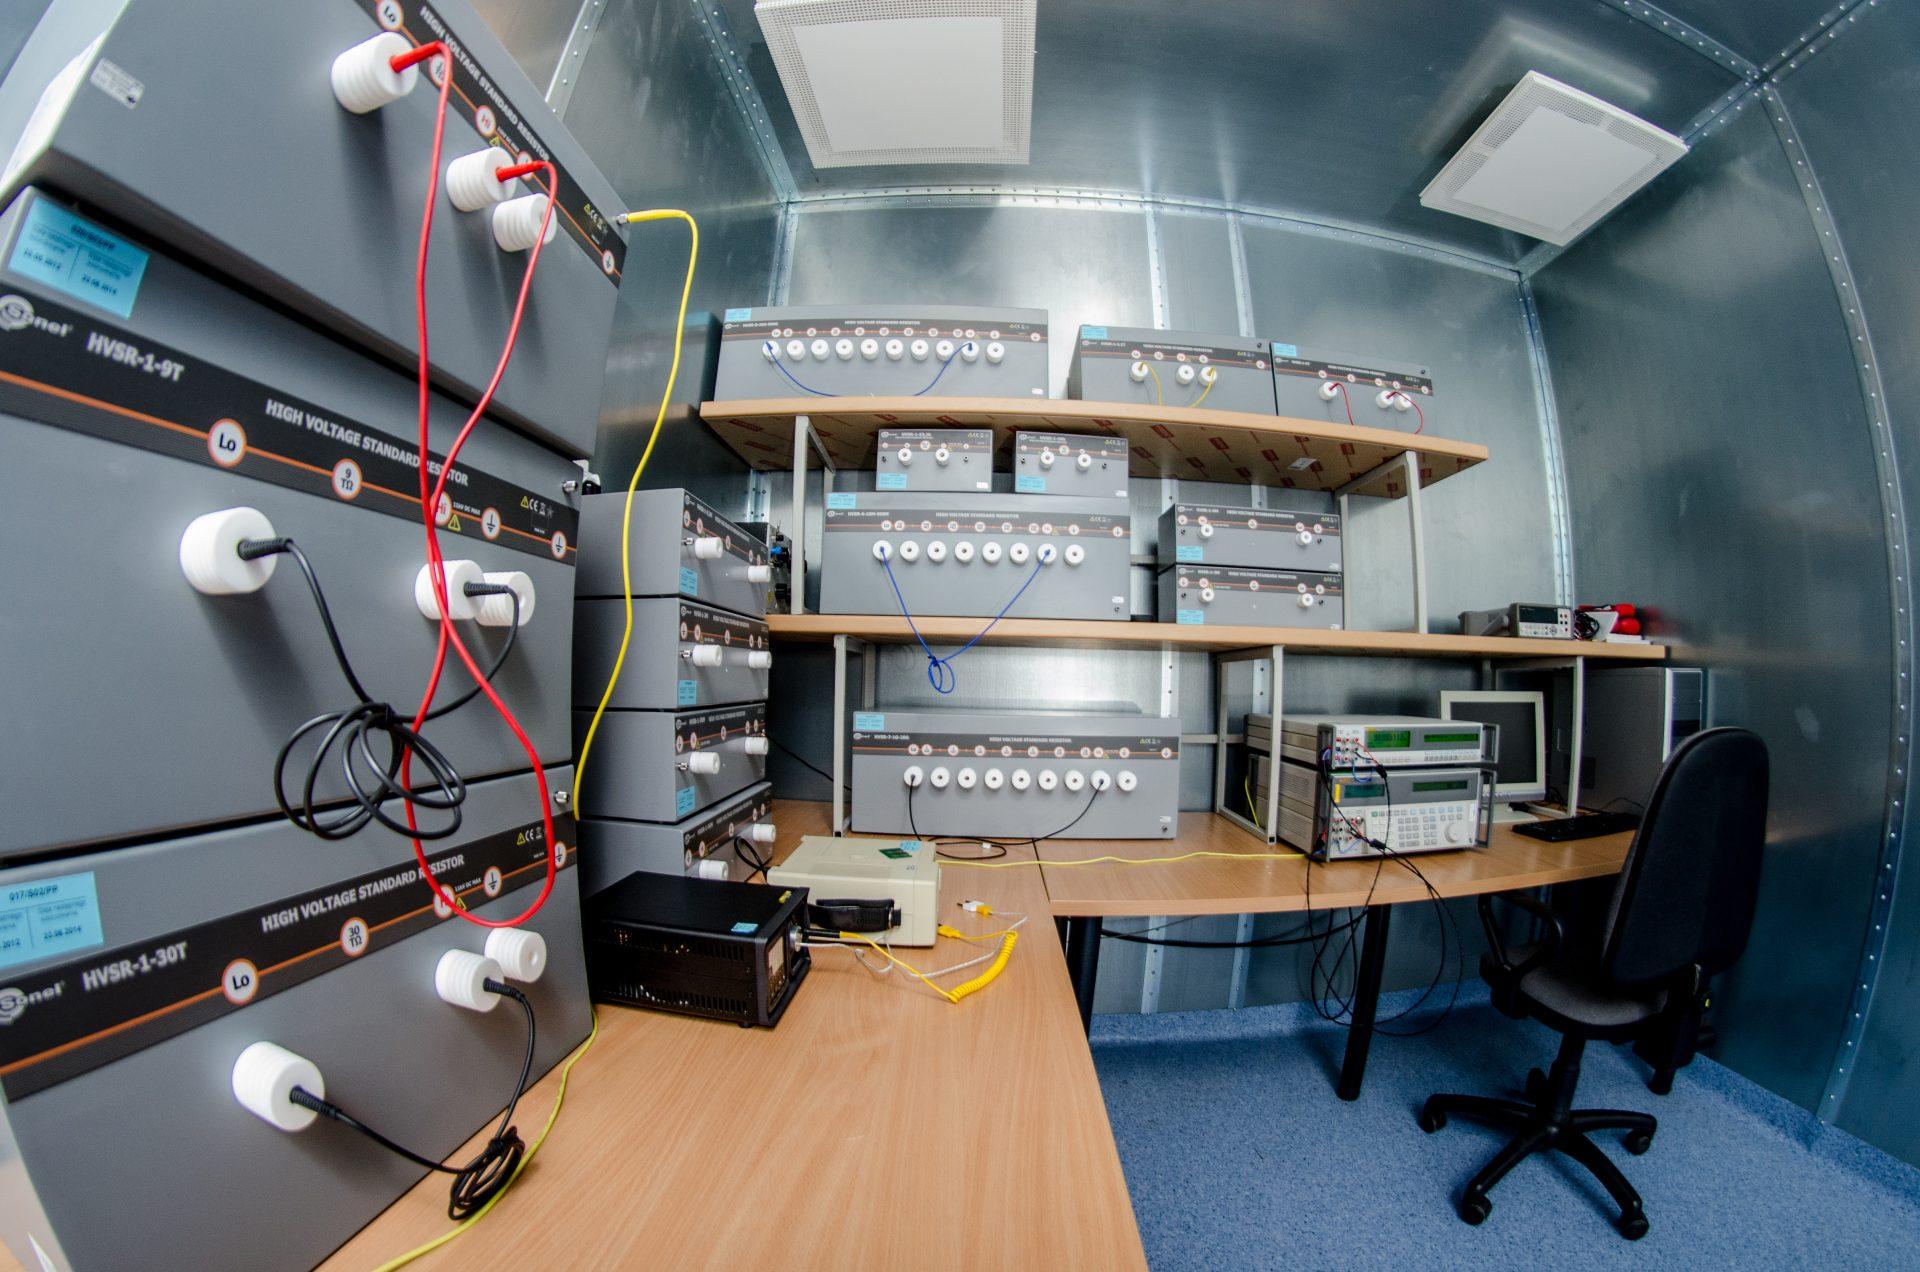 Sonel S.A. – laboratorium badawczo-wzorcujące